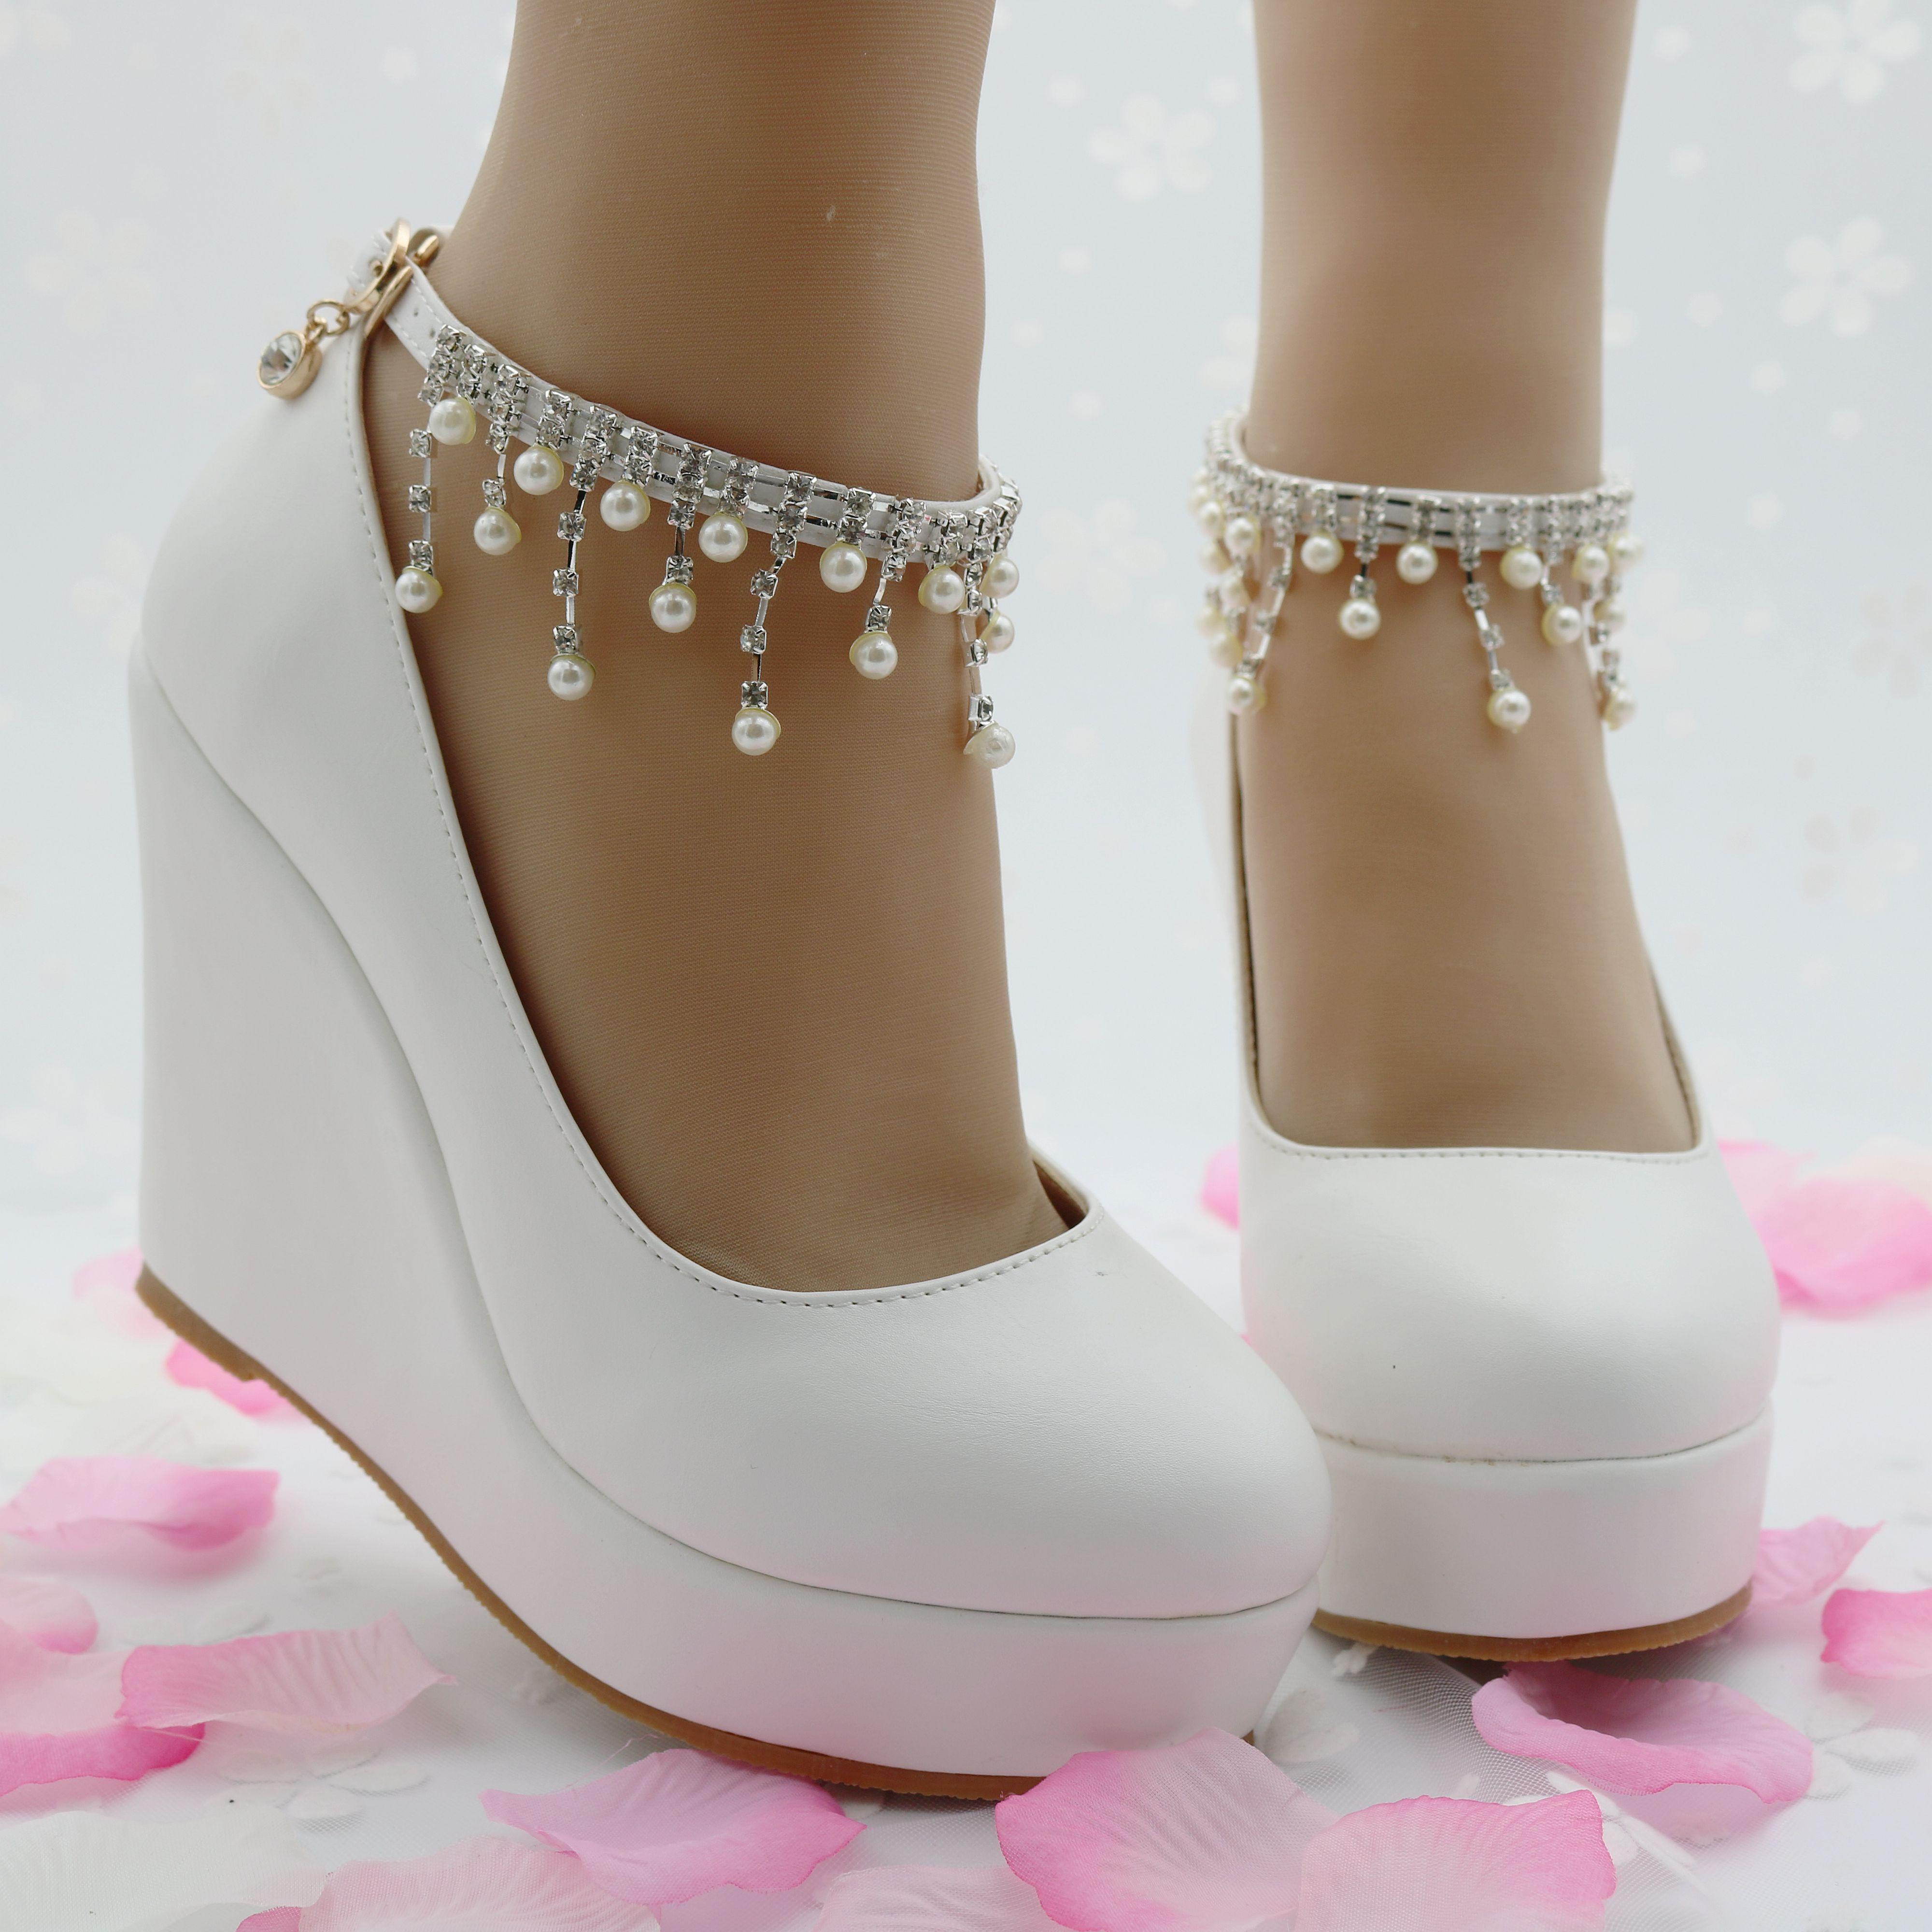 be514f65de white wedges pumps high heels platform wedges shoes tassel wedges heels